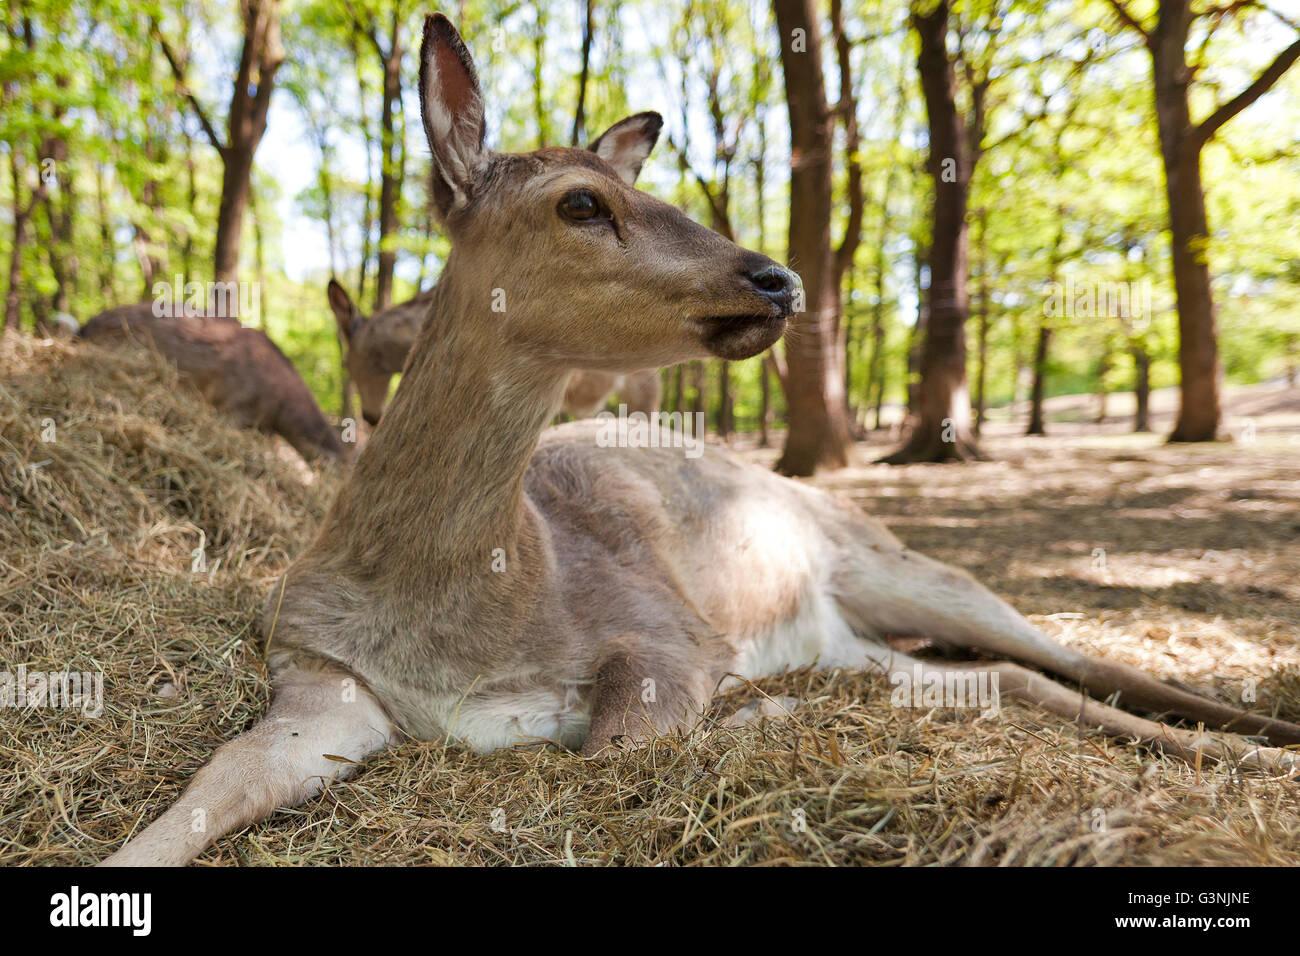 Cervi Sika o giapponese cervo (Cervus nippon), Hind, Ernstbrunn zoo, Austria Inferiore, Austria, Europa Immagini Stock